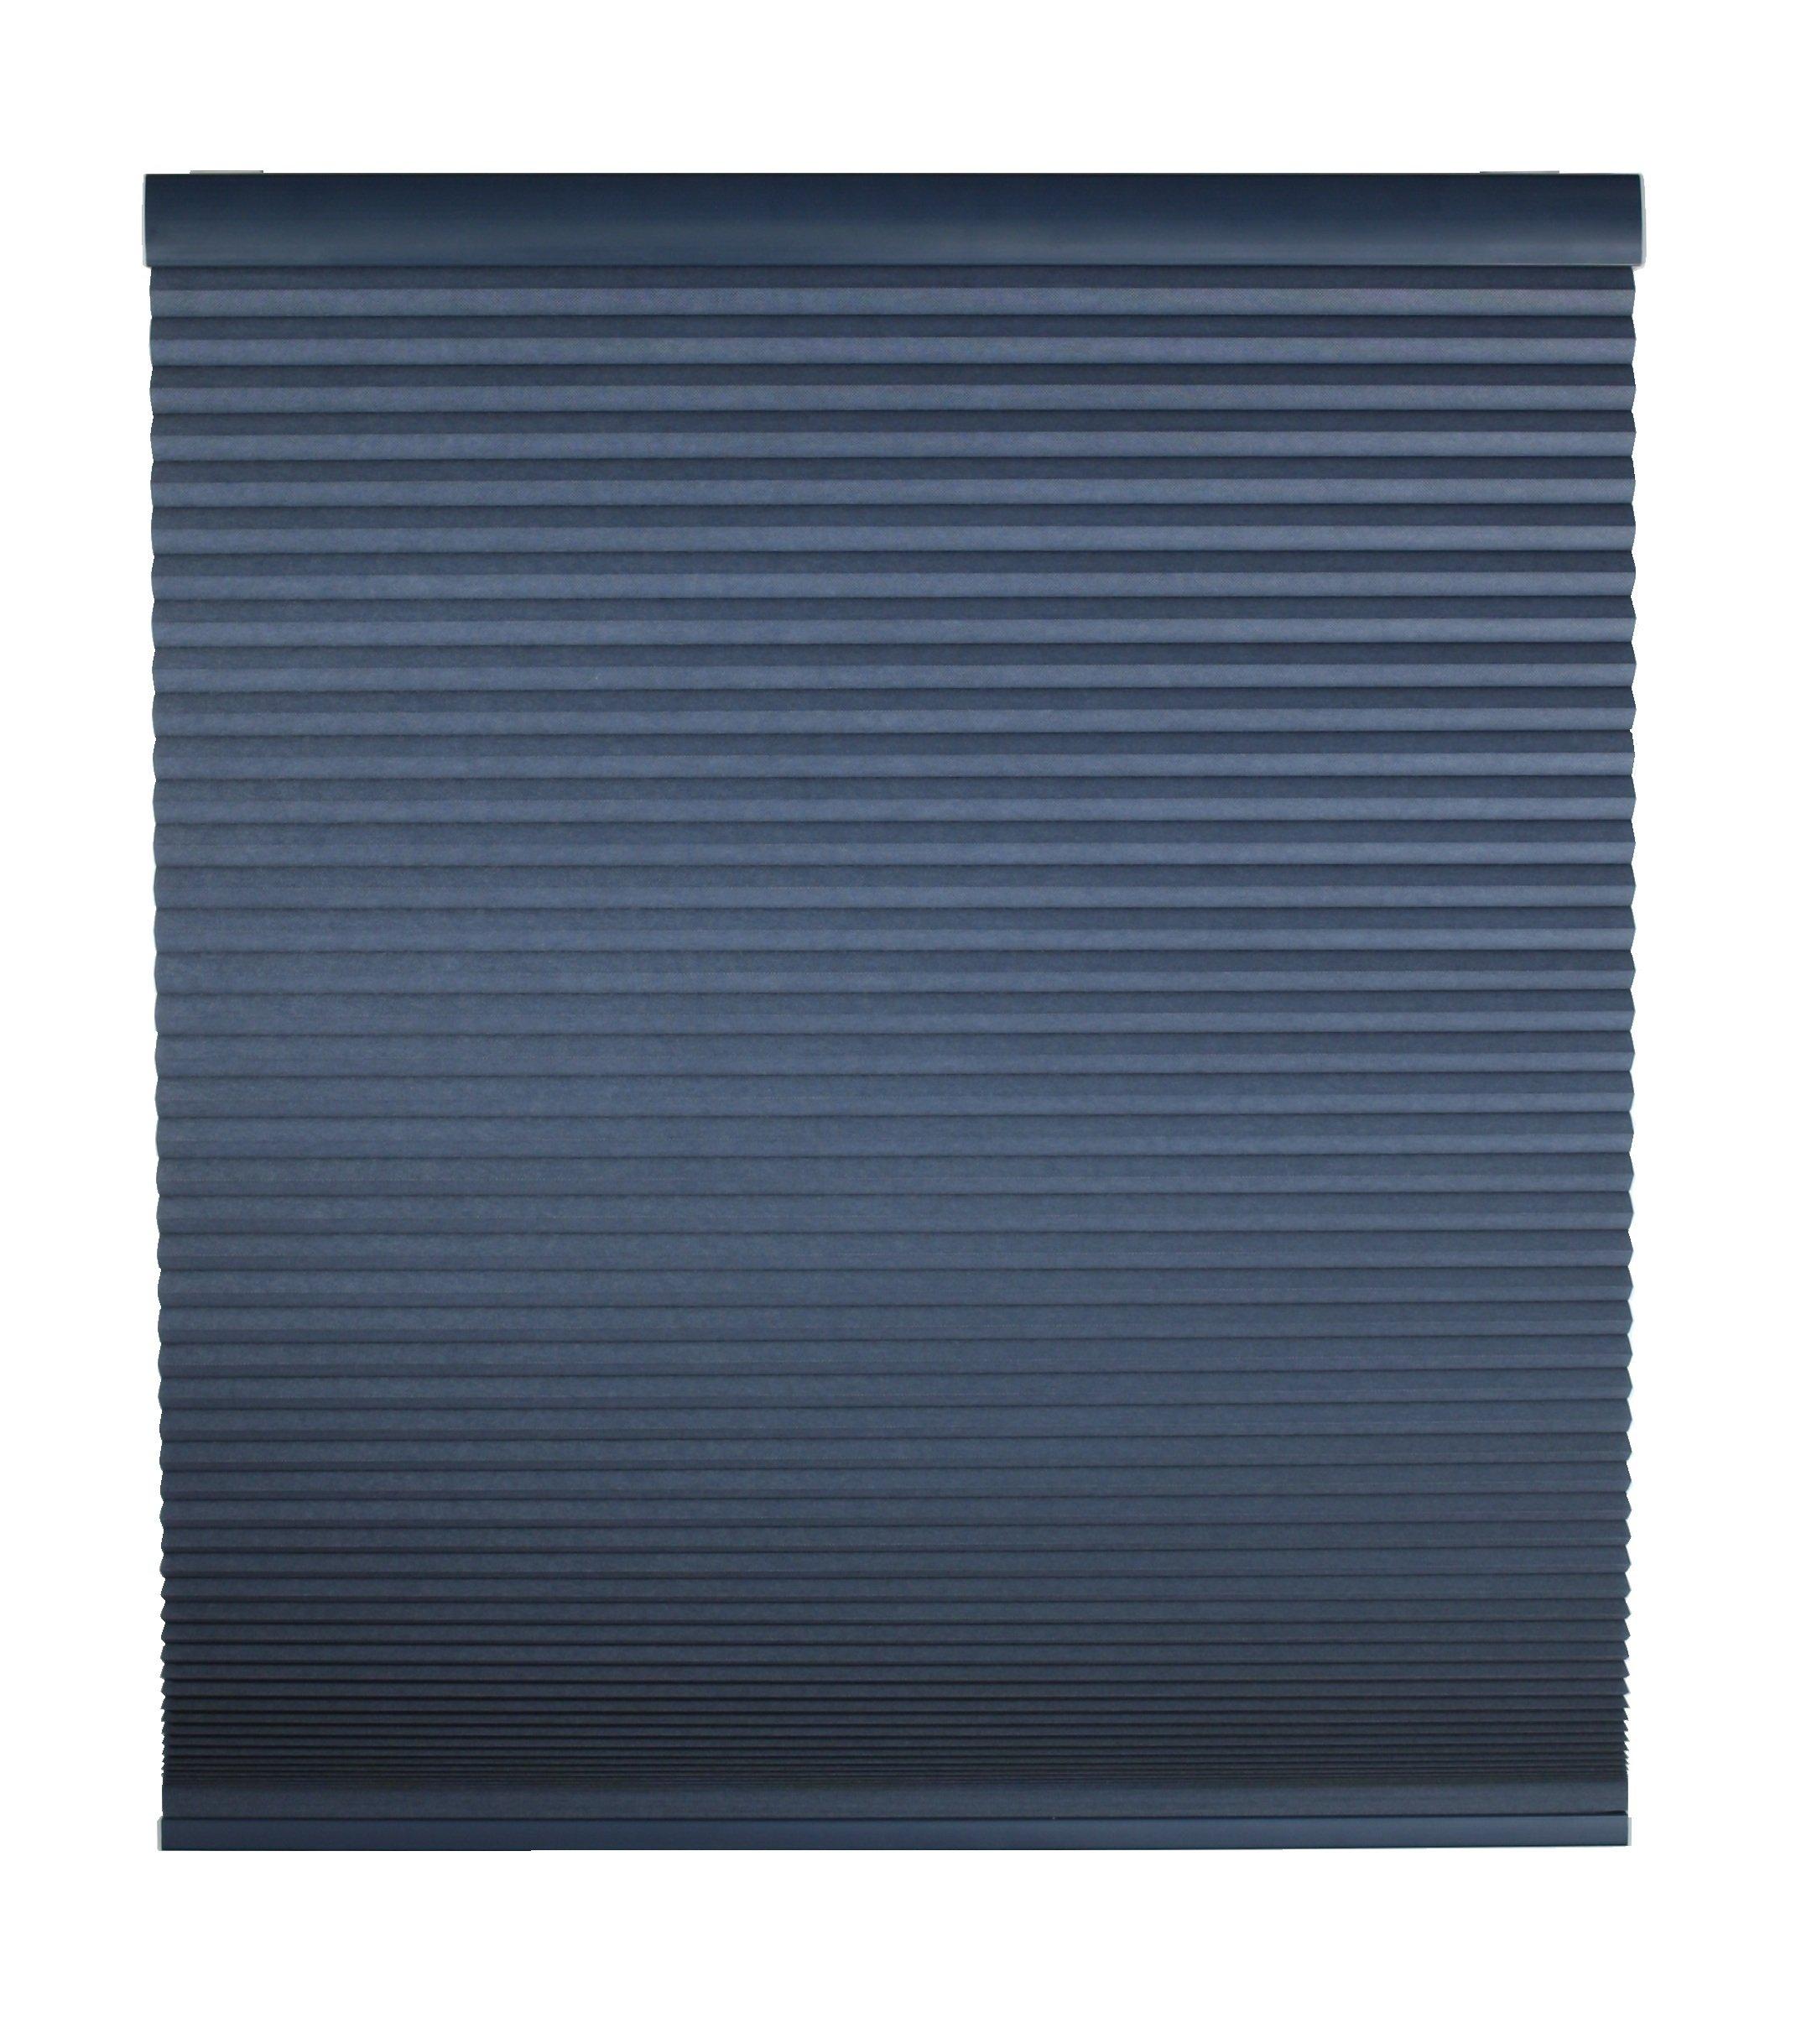 Cordless Blackout Cellular Shade 58 '' W X 48 '' L - Deep Blue